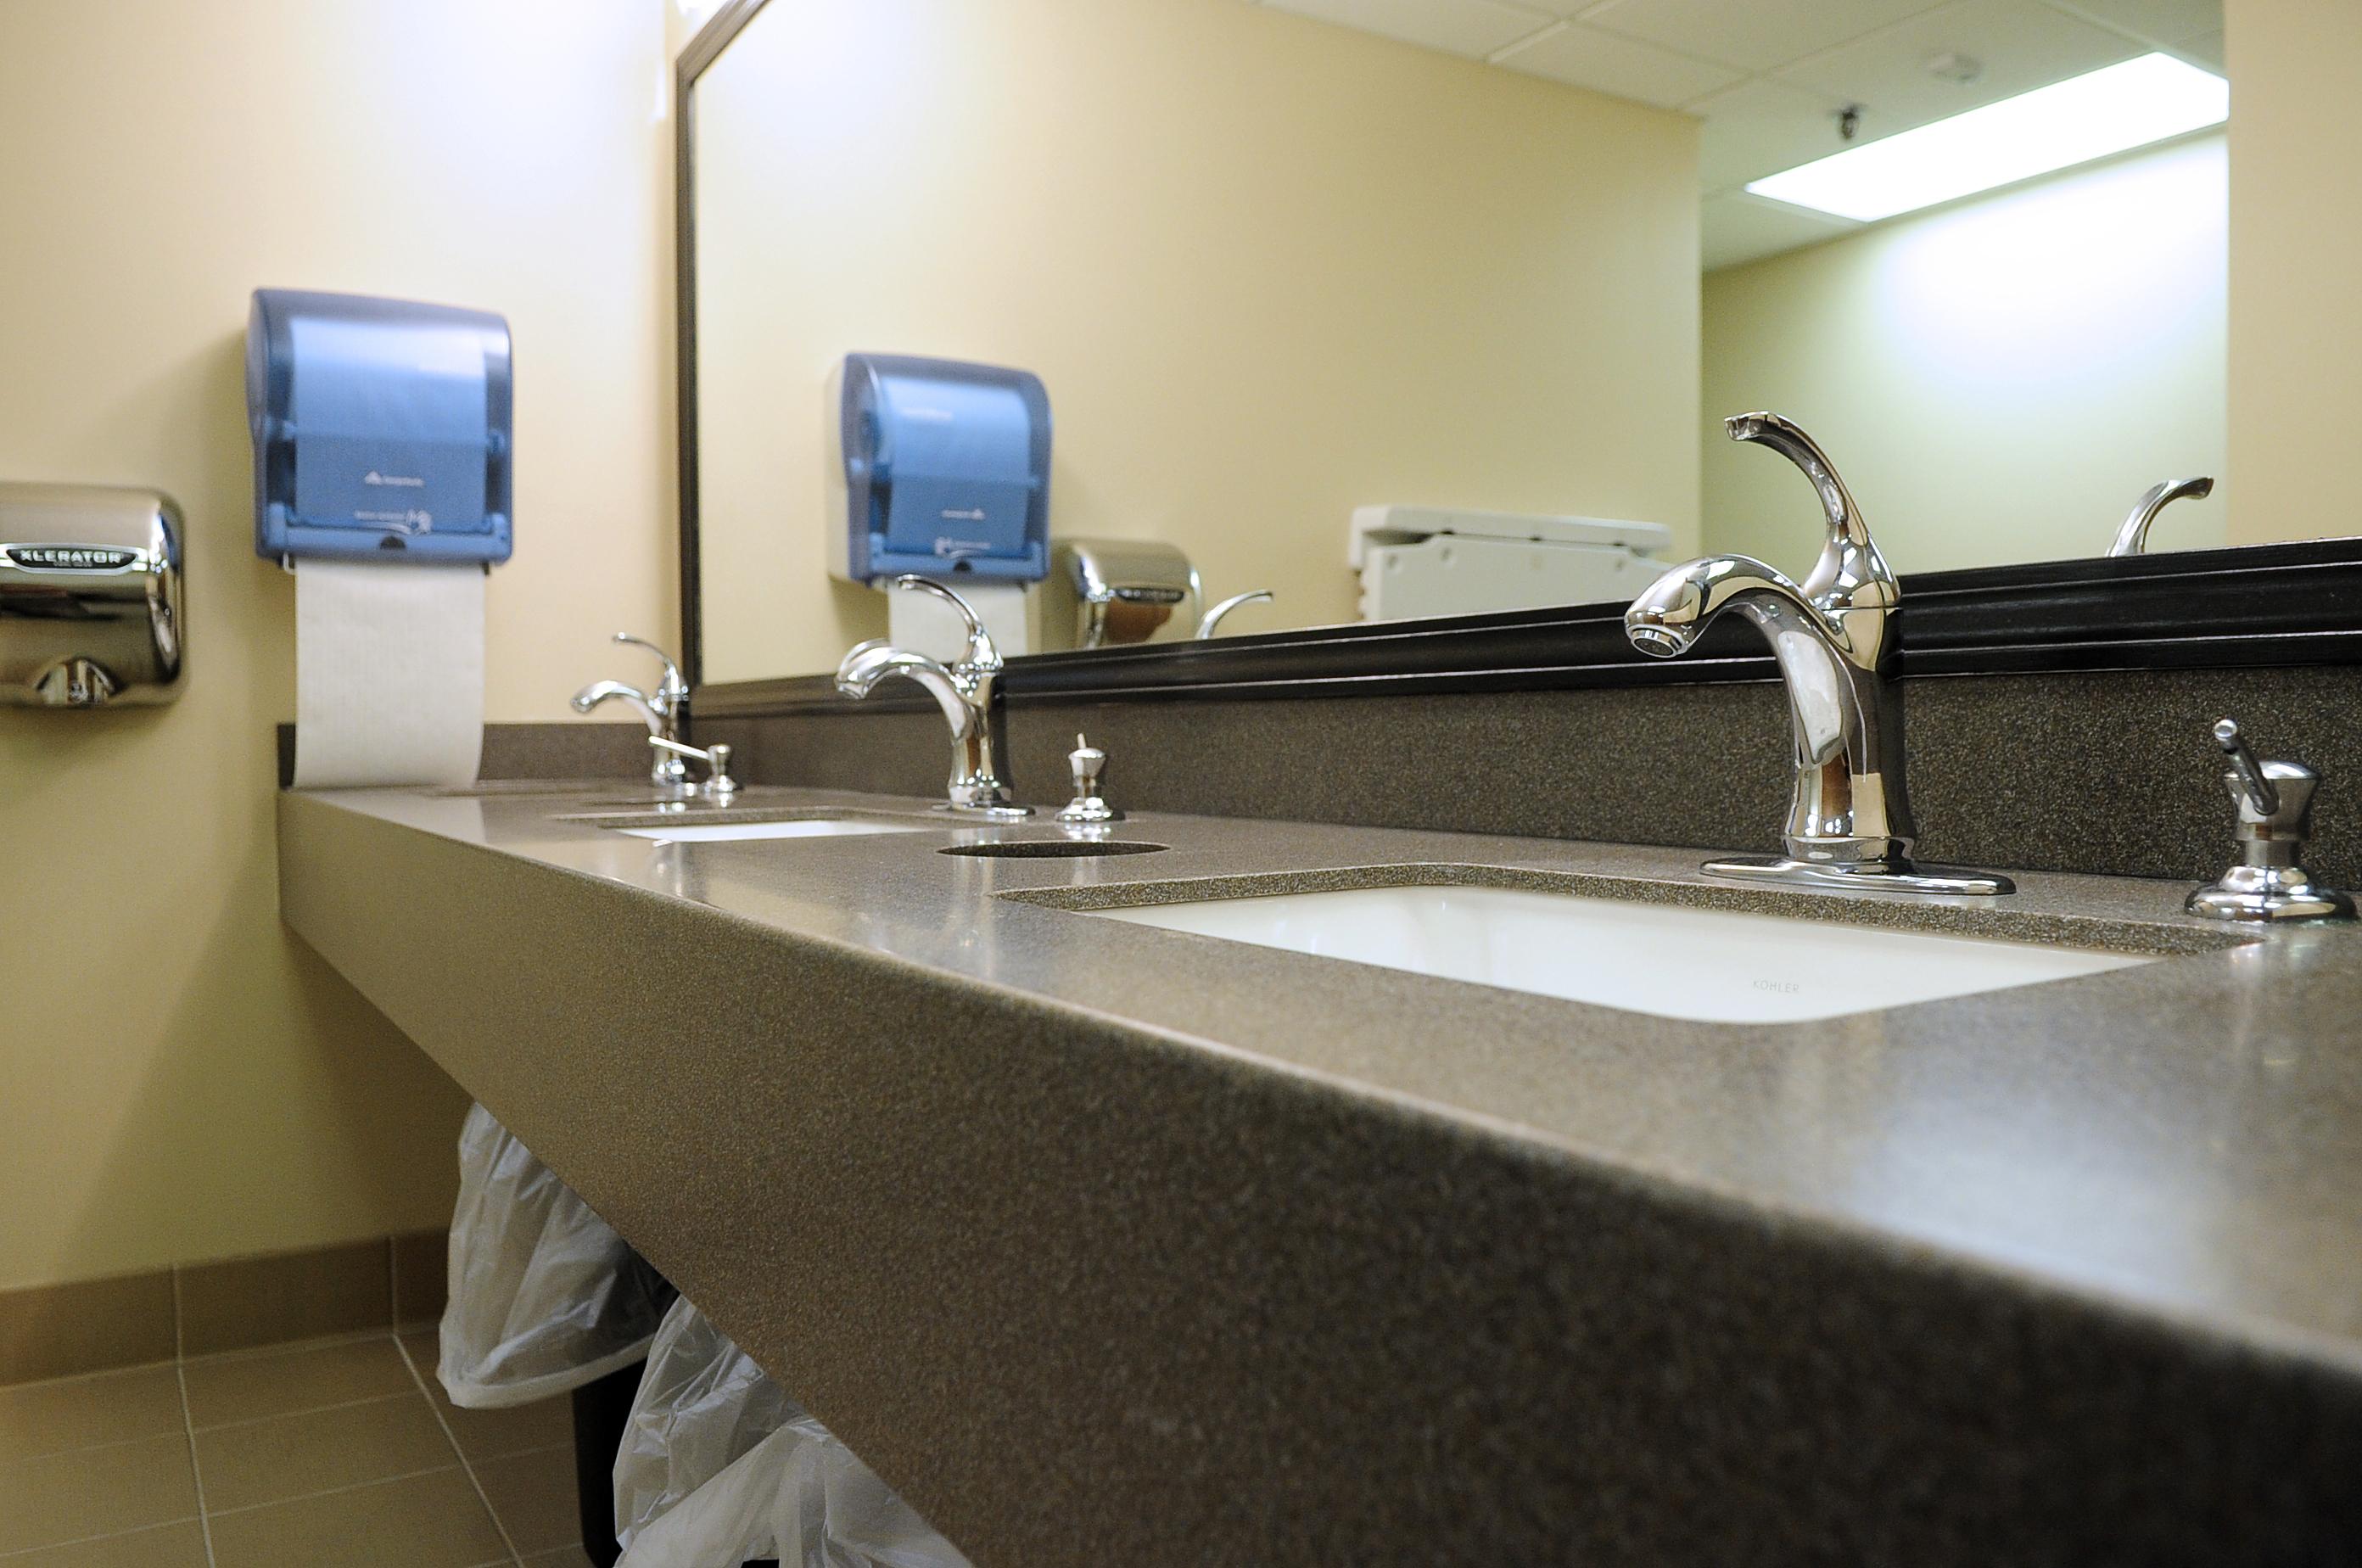 Vital plumbing consideration prior to a bathroom renovations